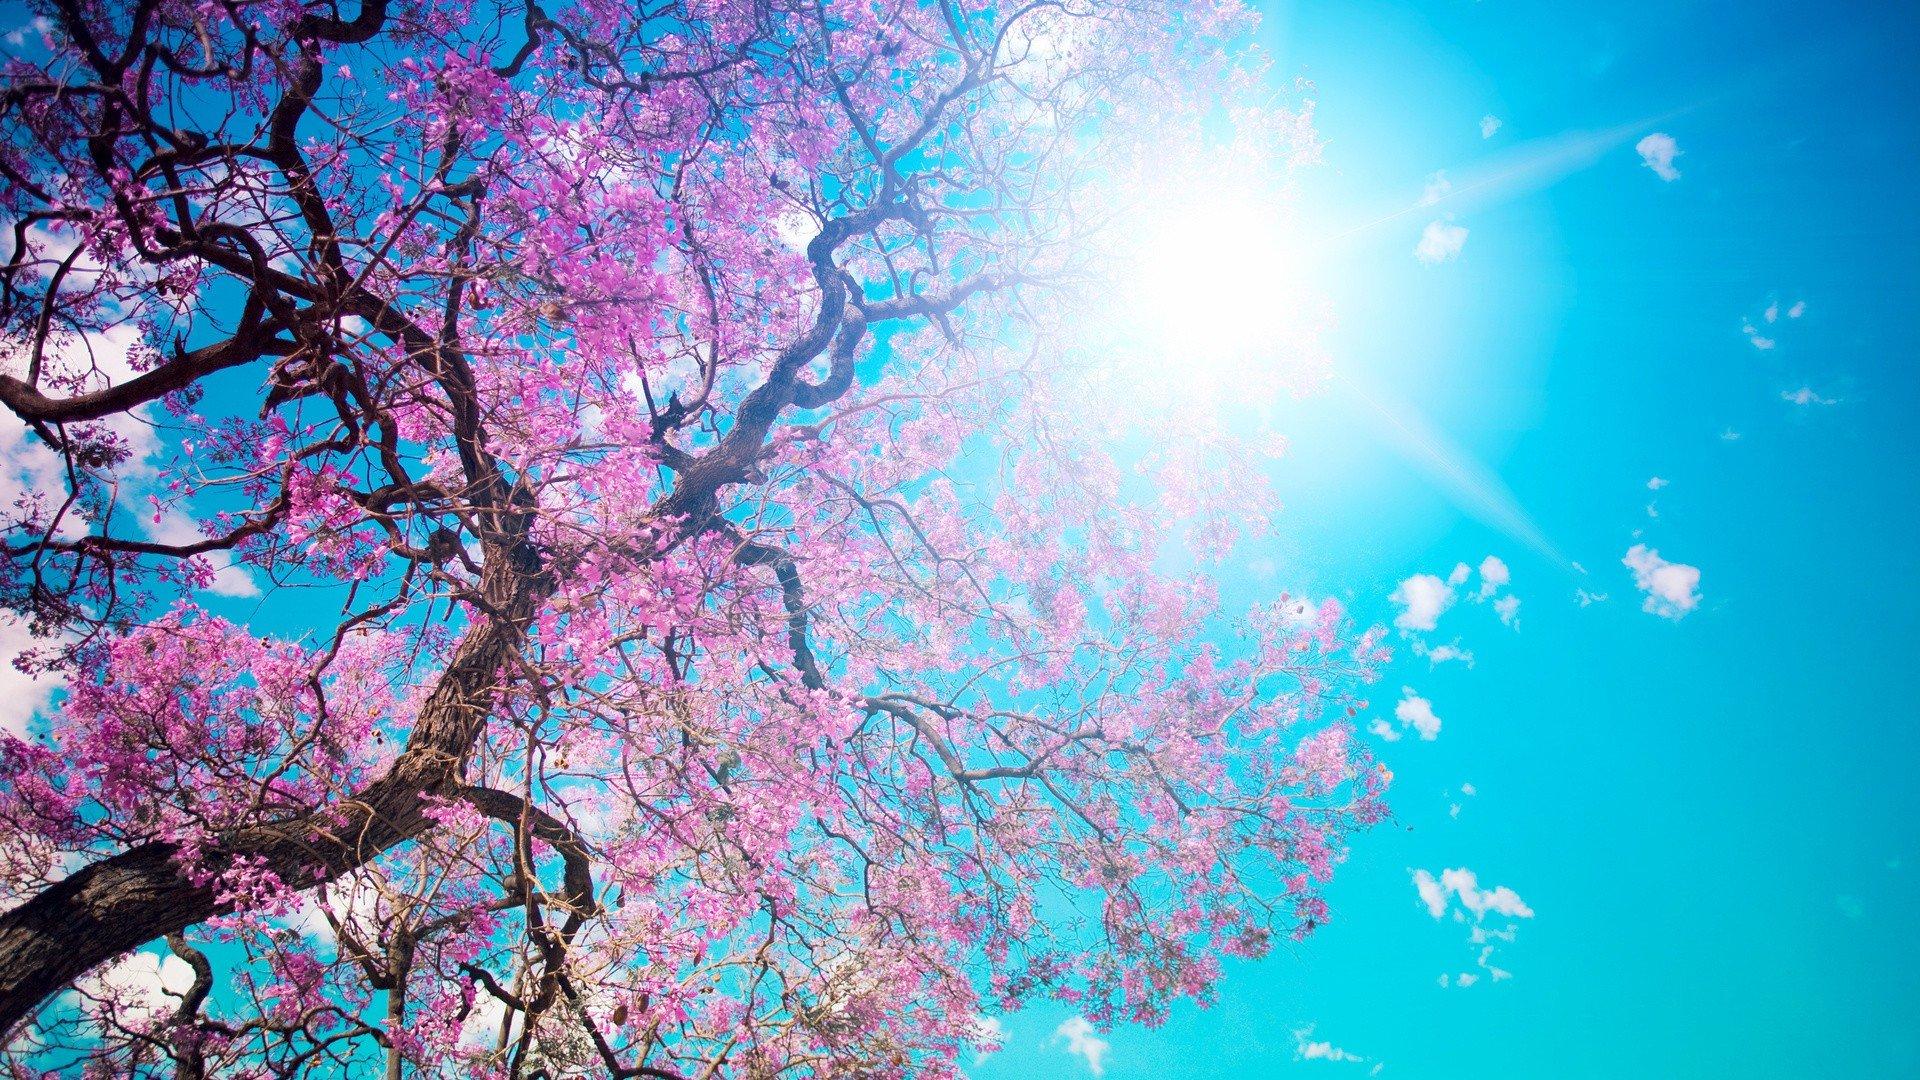 cherry-blossom-tree-wallpaper-gallery-nsur18